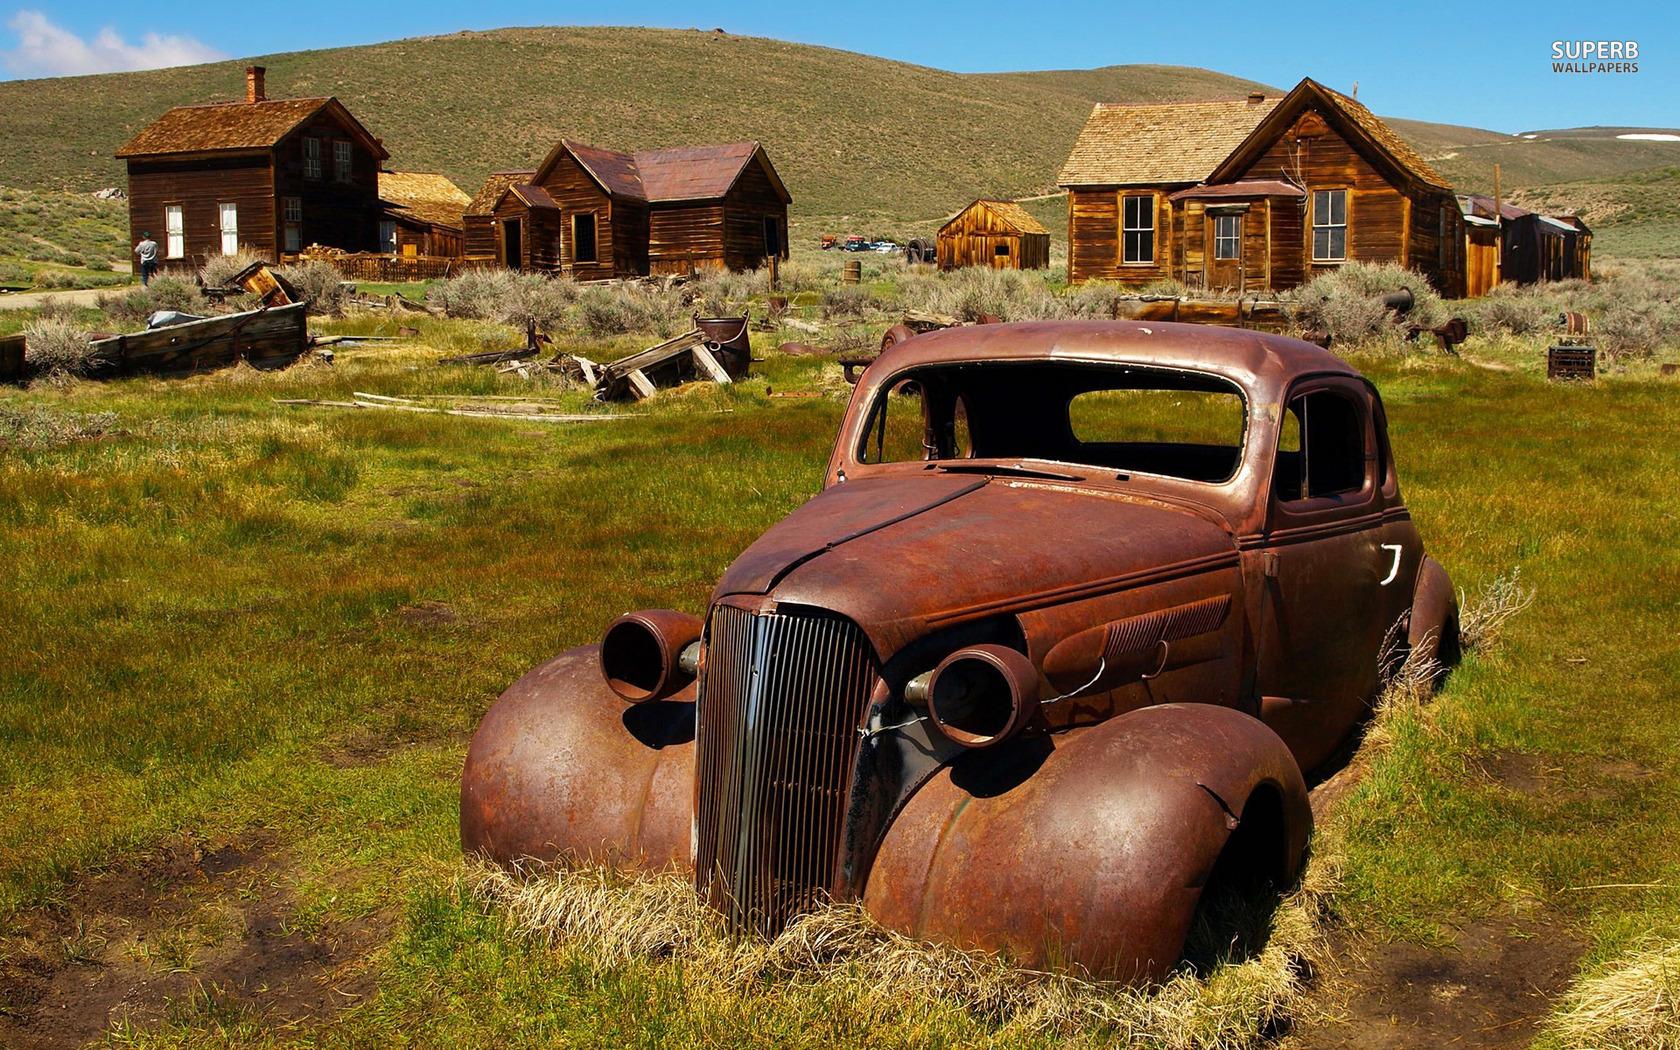 Rusty Old Car Wallpaper HD 1620   HD Wallpaper Site 1680x1050